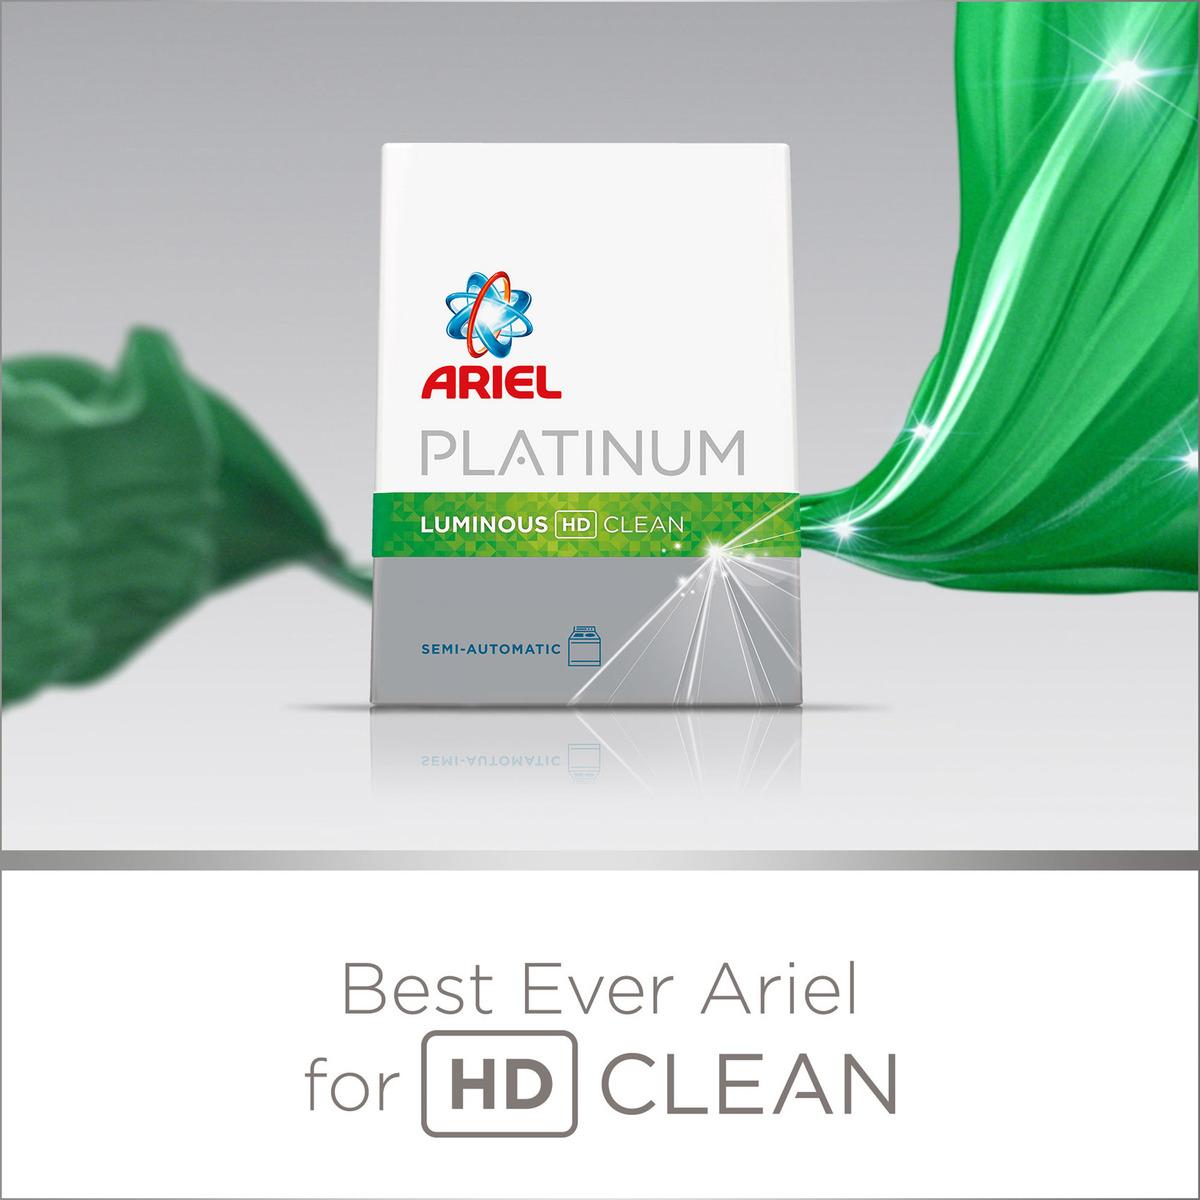 Buy Ariel Platinum Laundry Powder Detergent Luminous HD